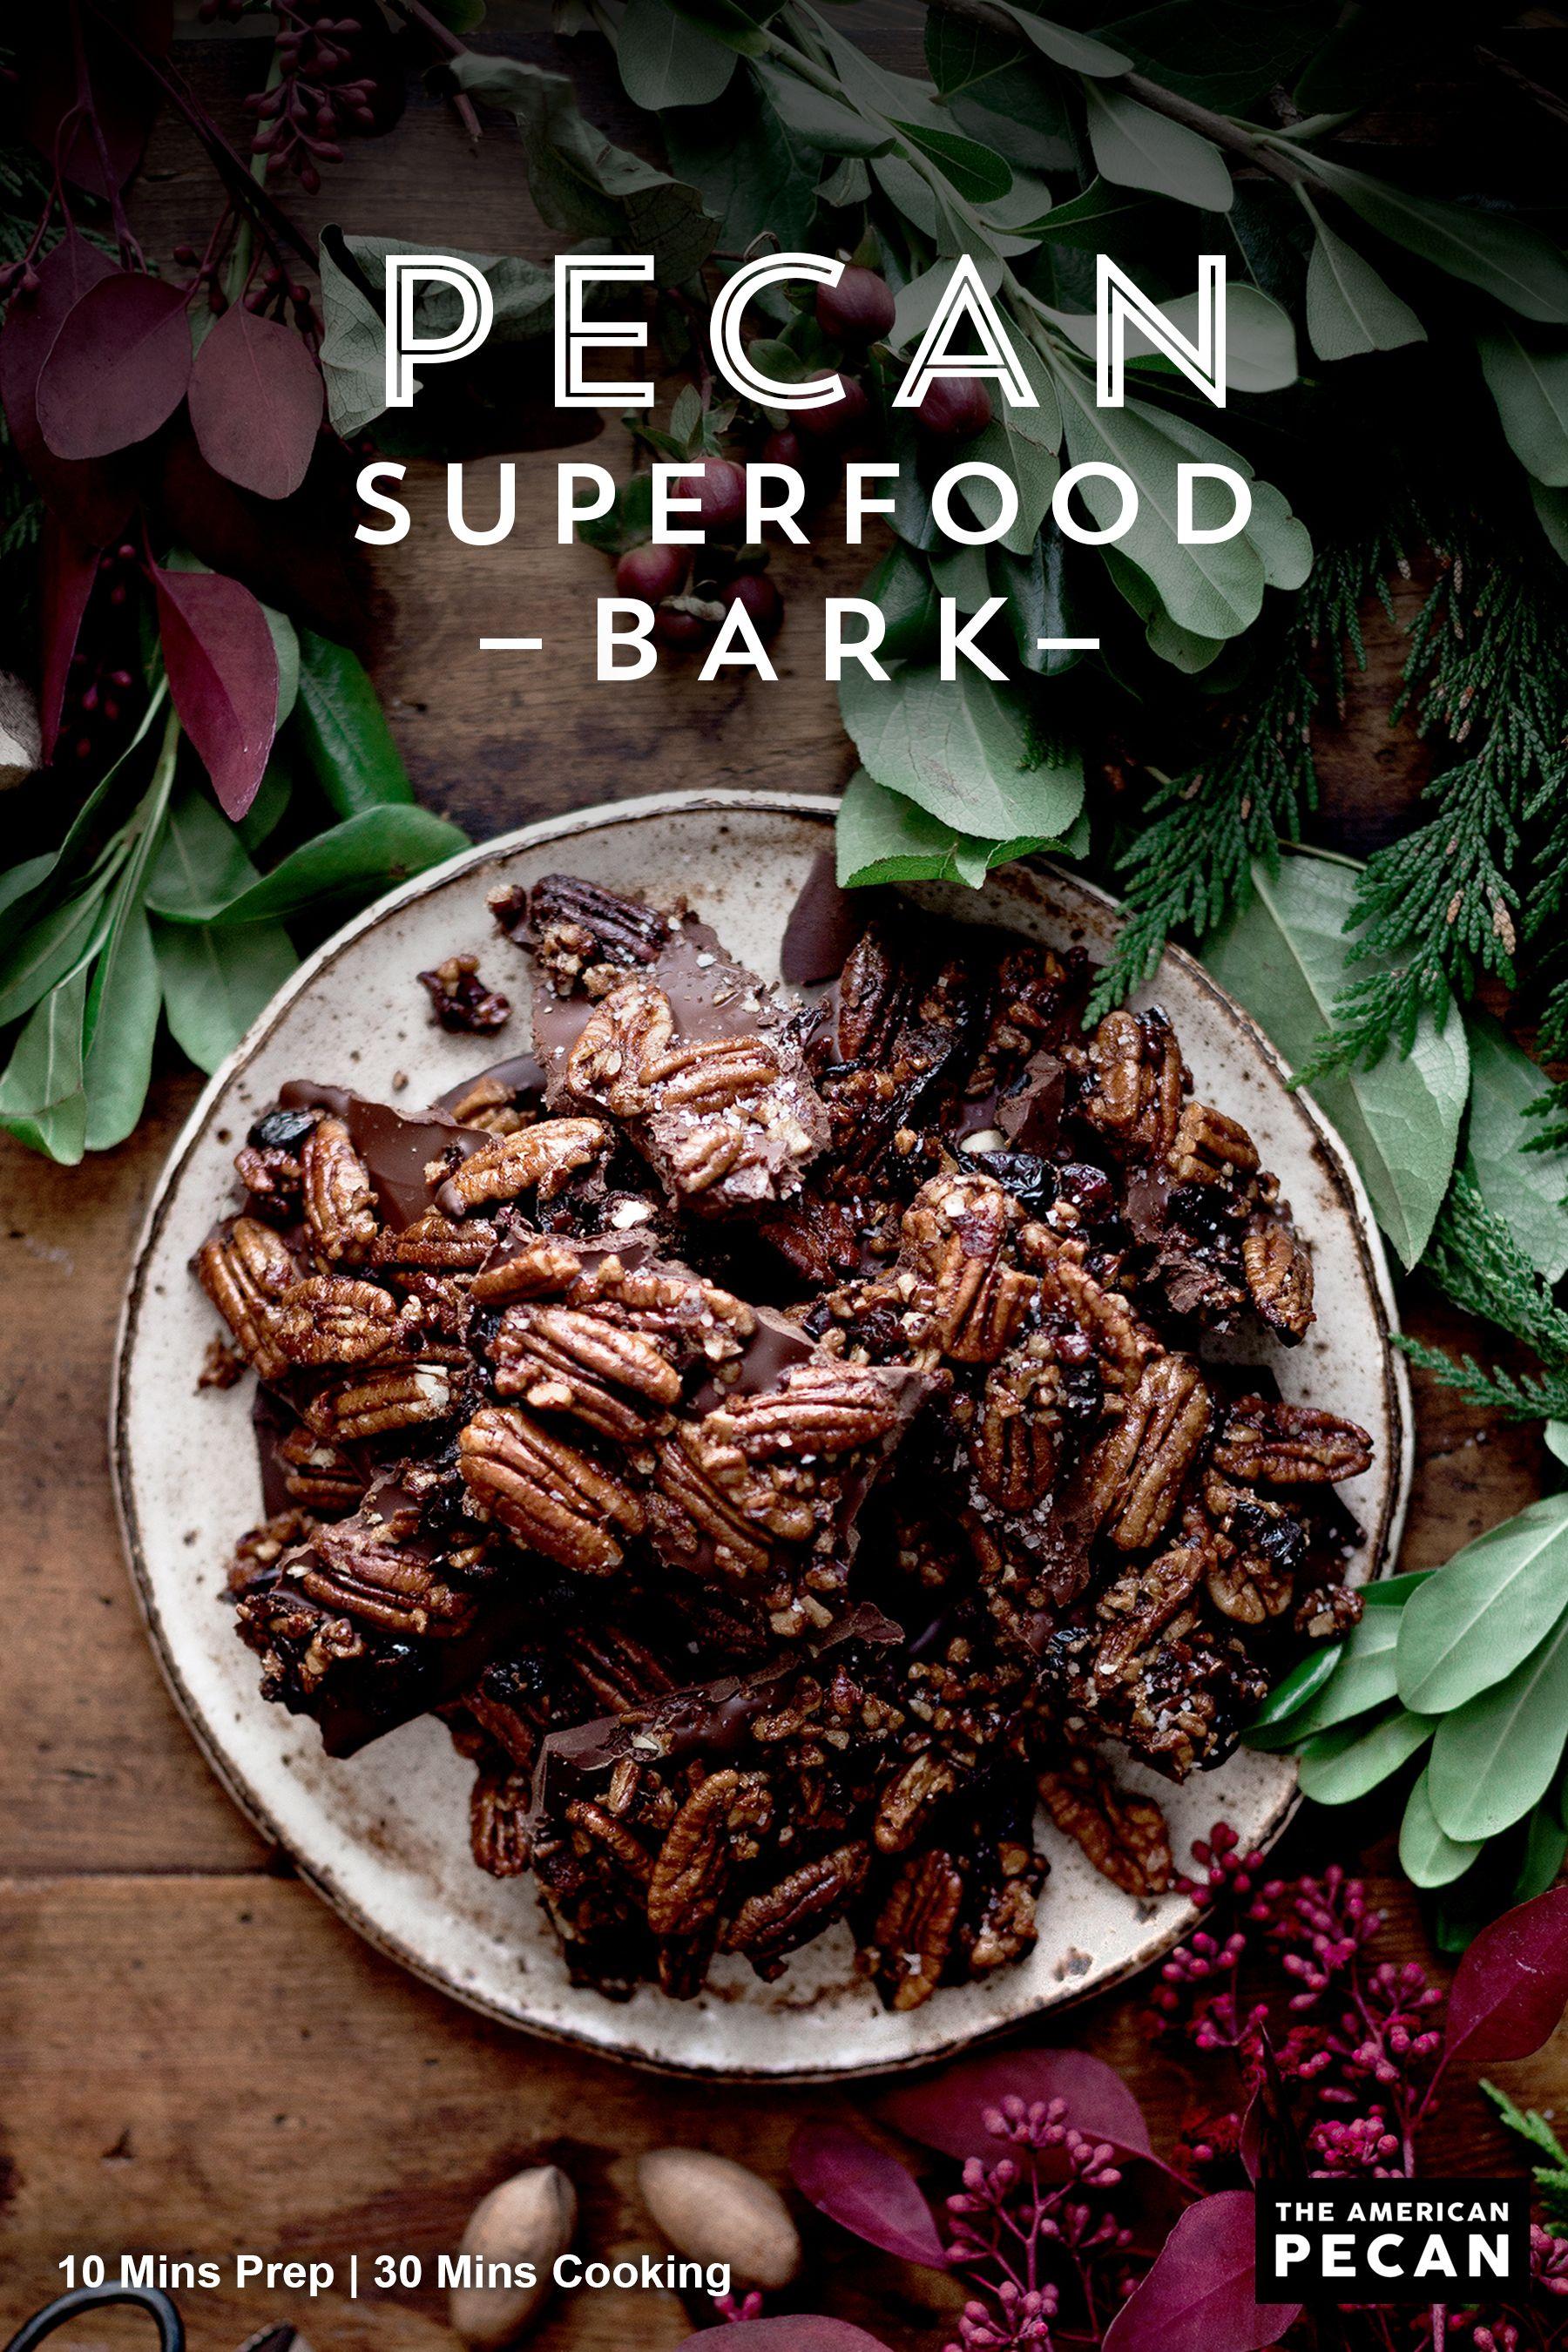 Maple pecan superfood bark receta postres maple pecan superfood bark forumfinder Image collections